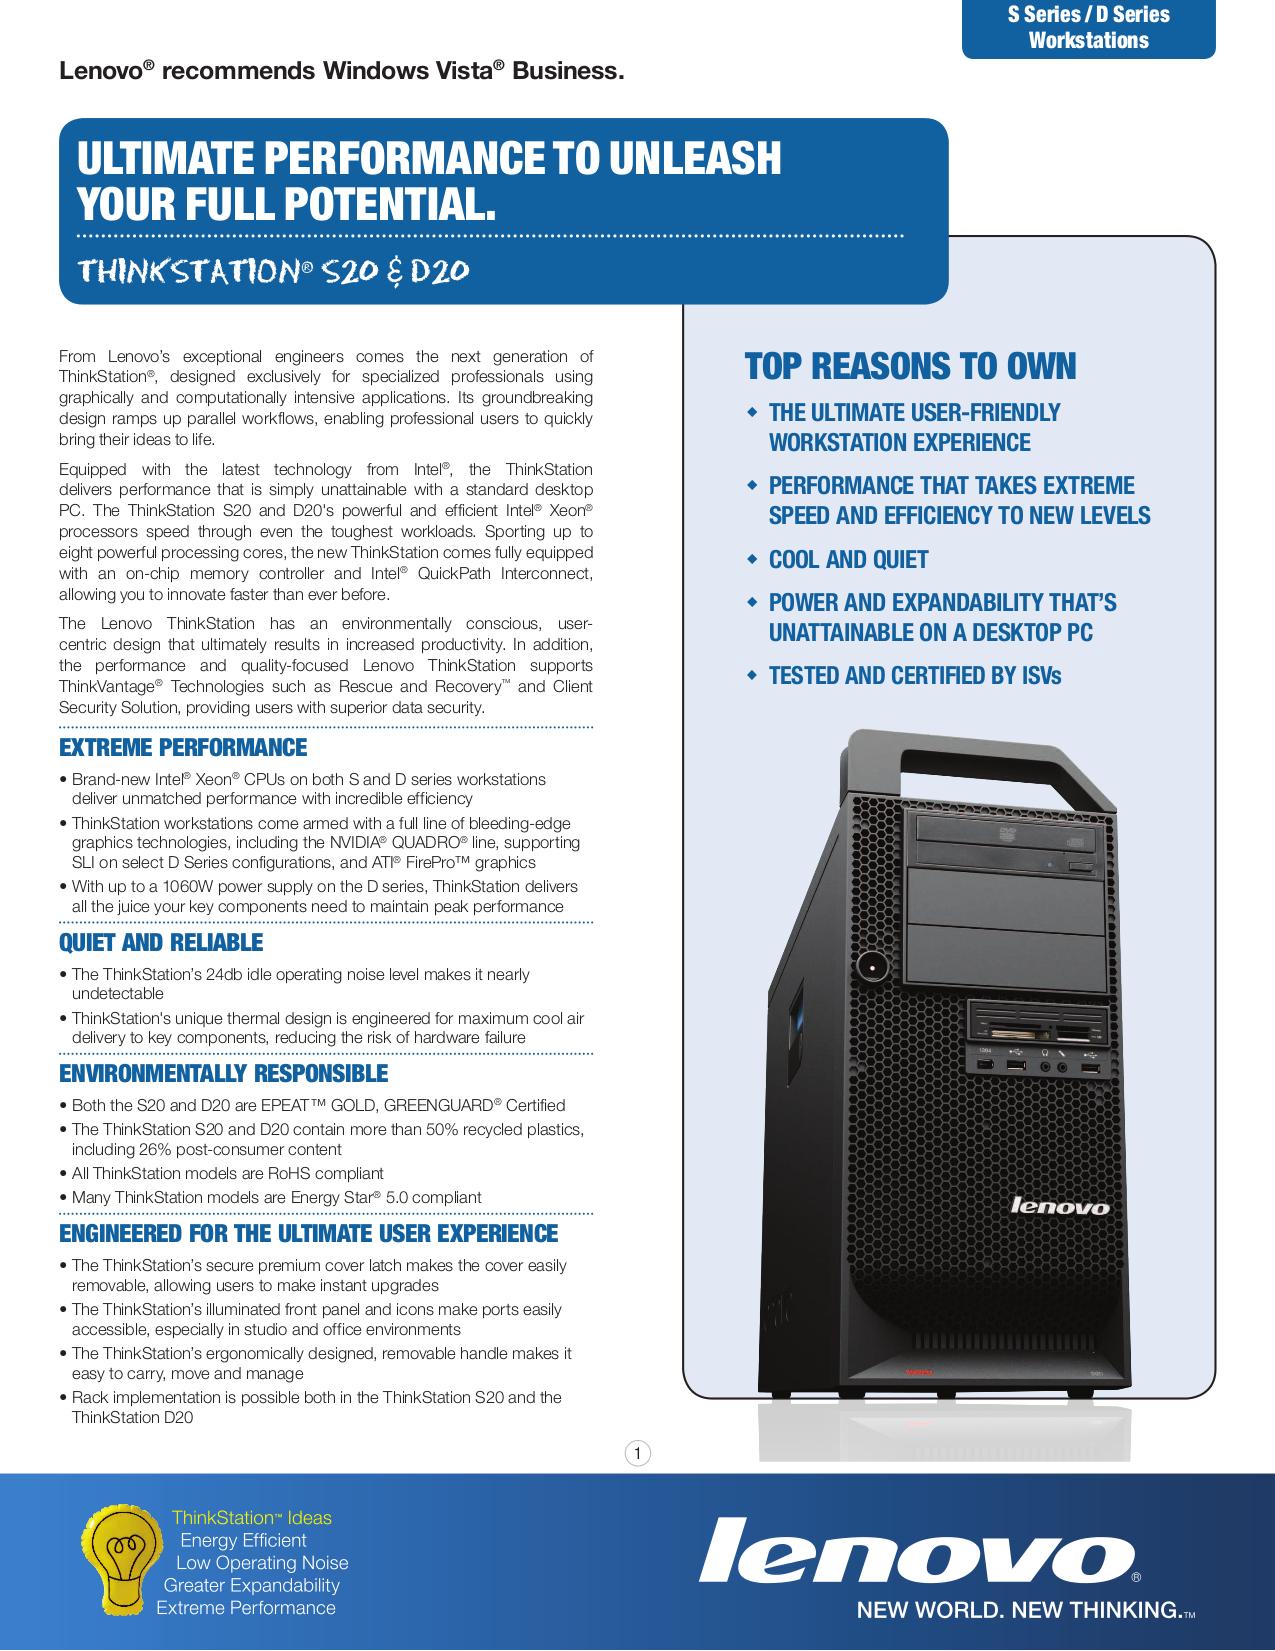 pdf for Lenovo Desktop ThinkStation E20 4222 manual